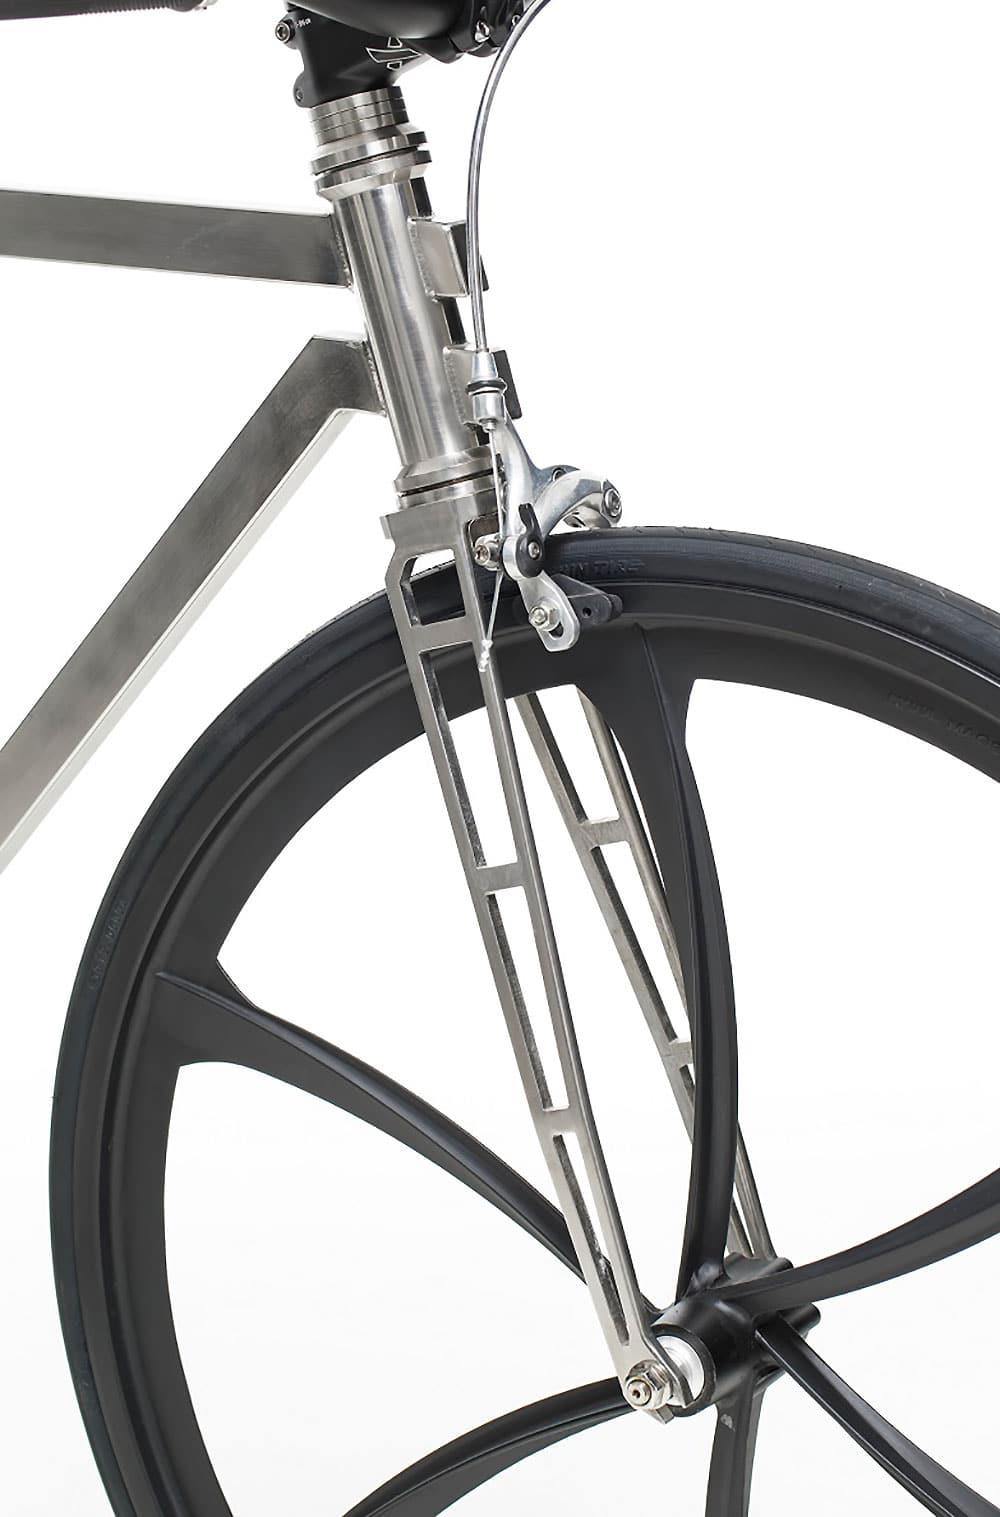 Lamina un nouveau vélo urbain fixie inoxydable